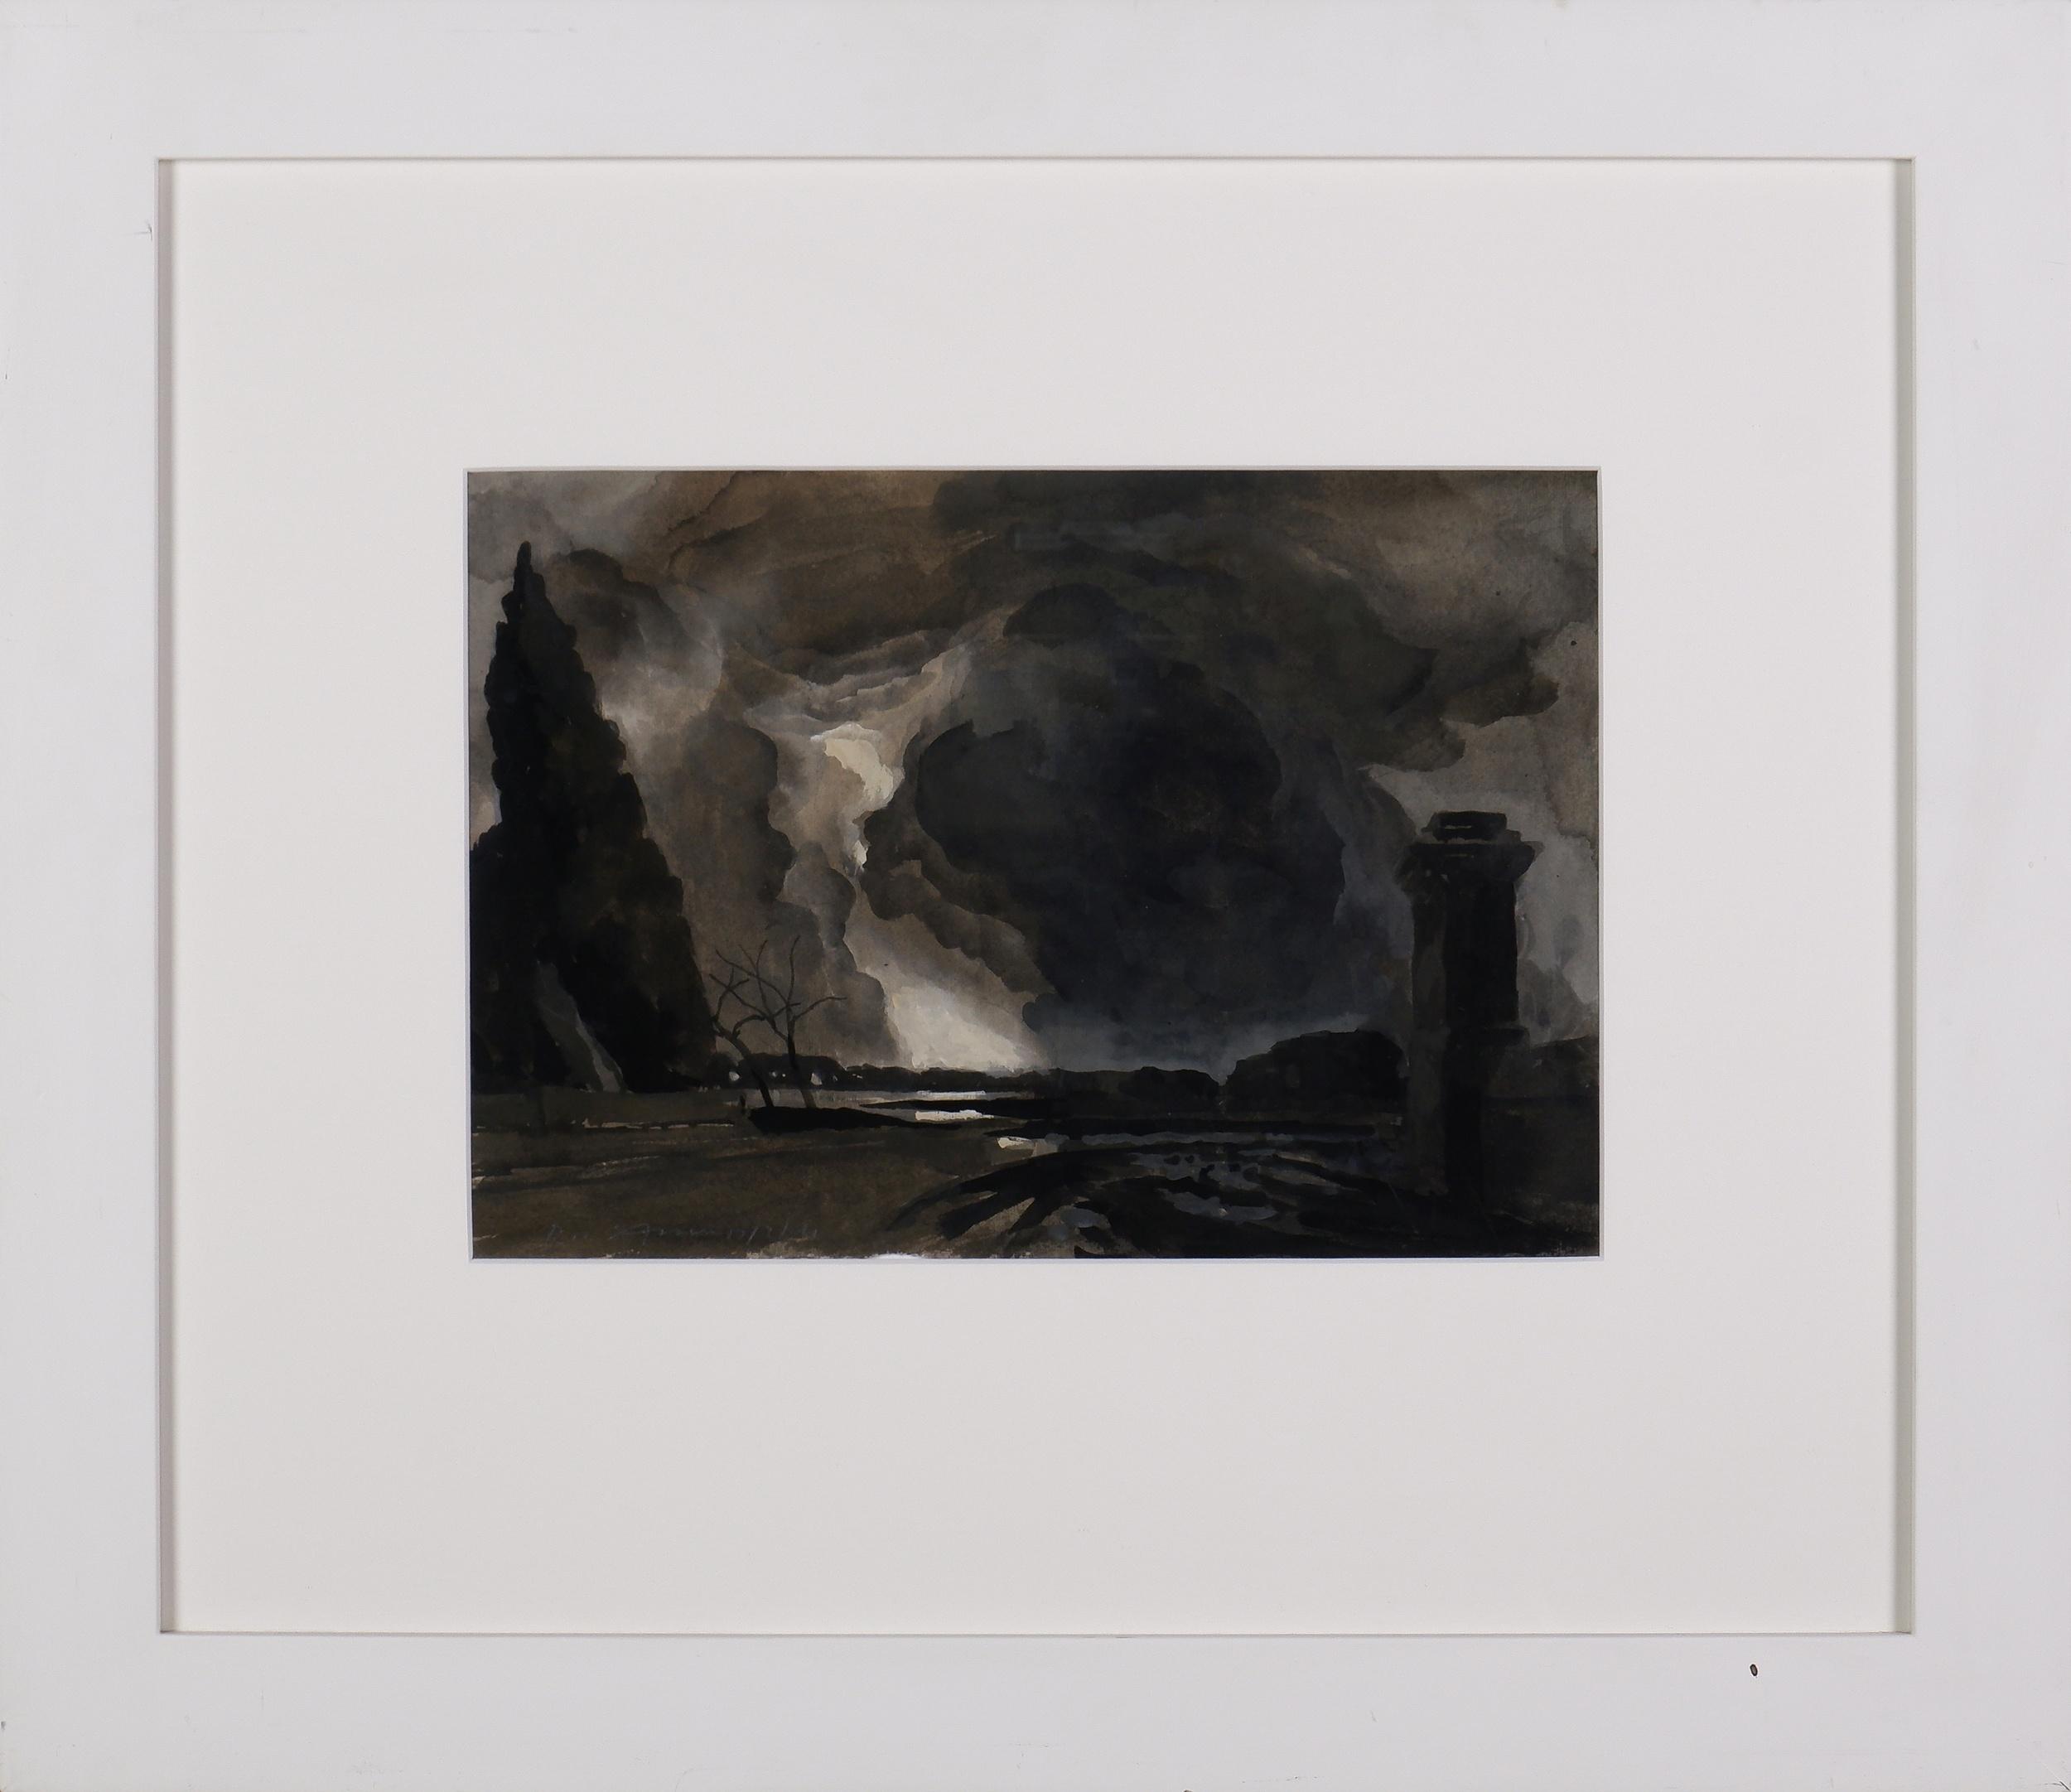 'Rick Amor (born 1948), The Cloud 2004, Gouache on Paper'